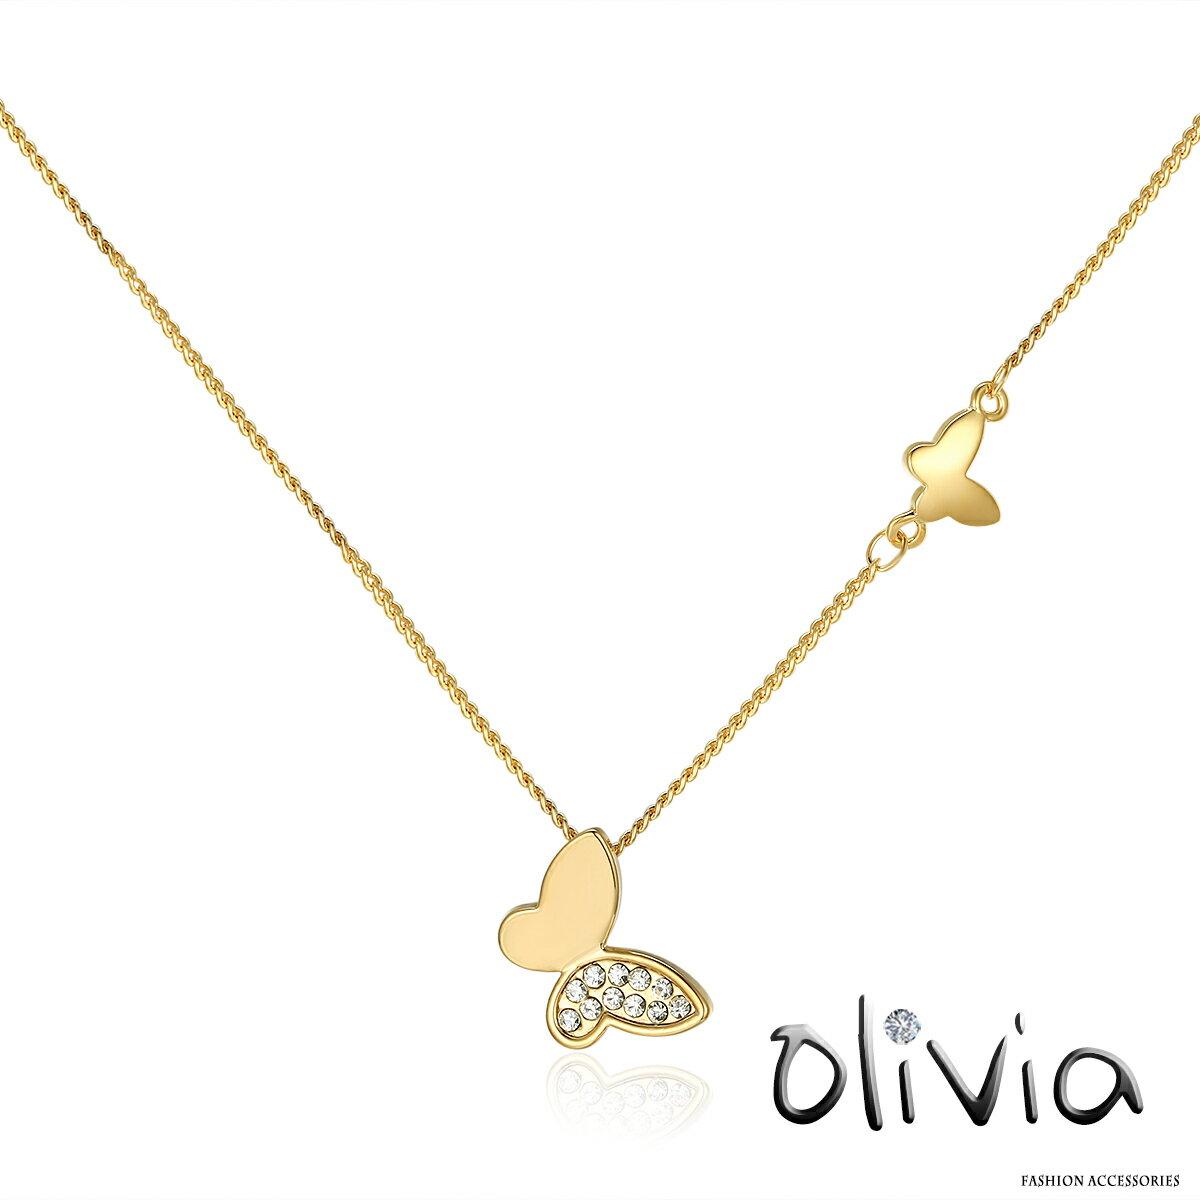 Olivia 鎖骨項鍊 時尚雙蝴蝶水鑽鎖骨項鍊【M00626】